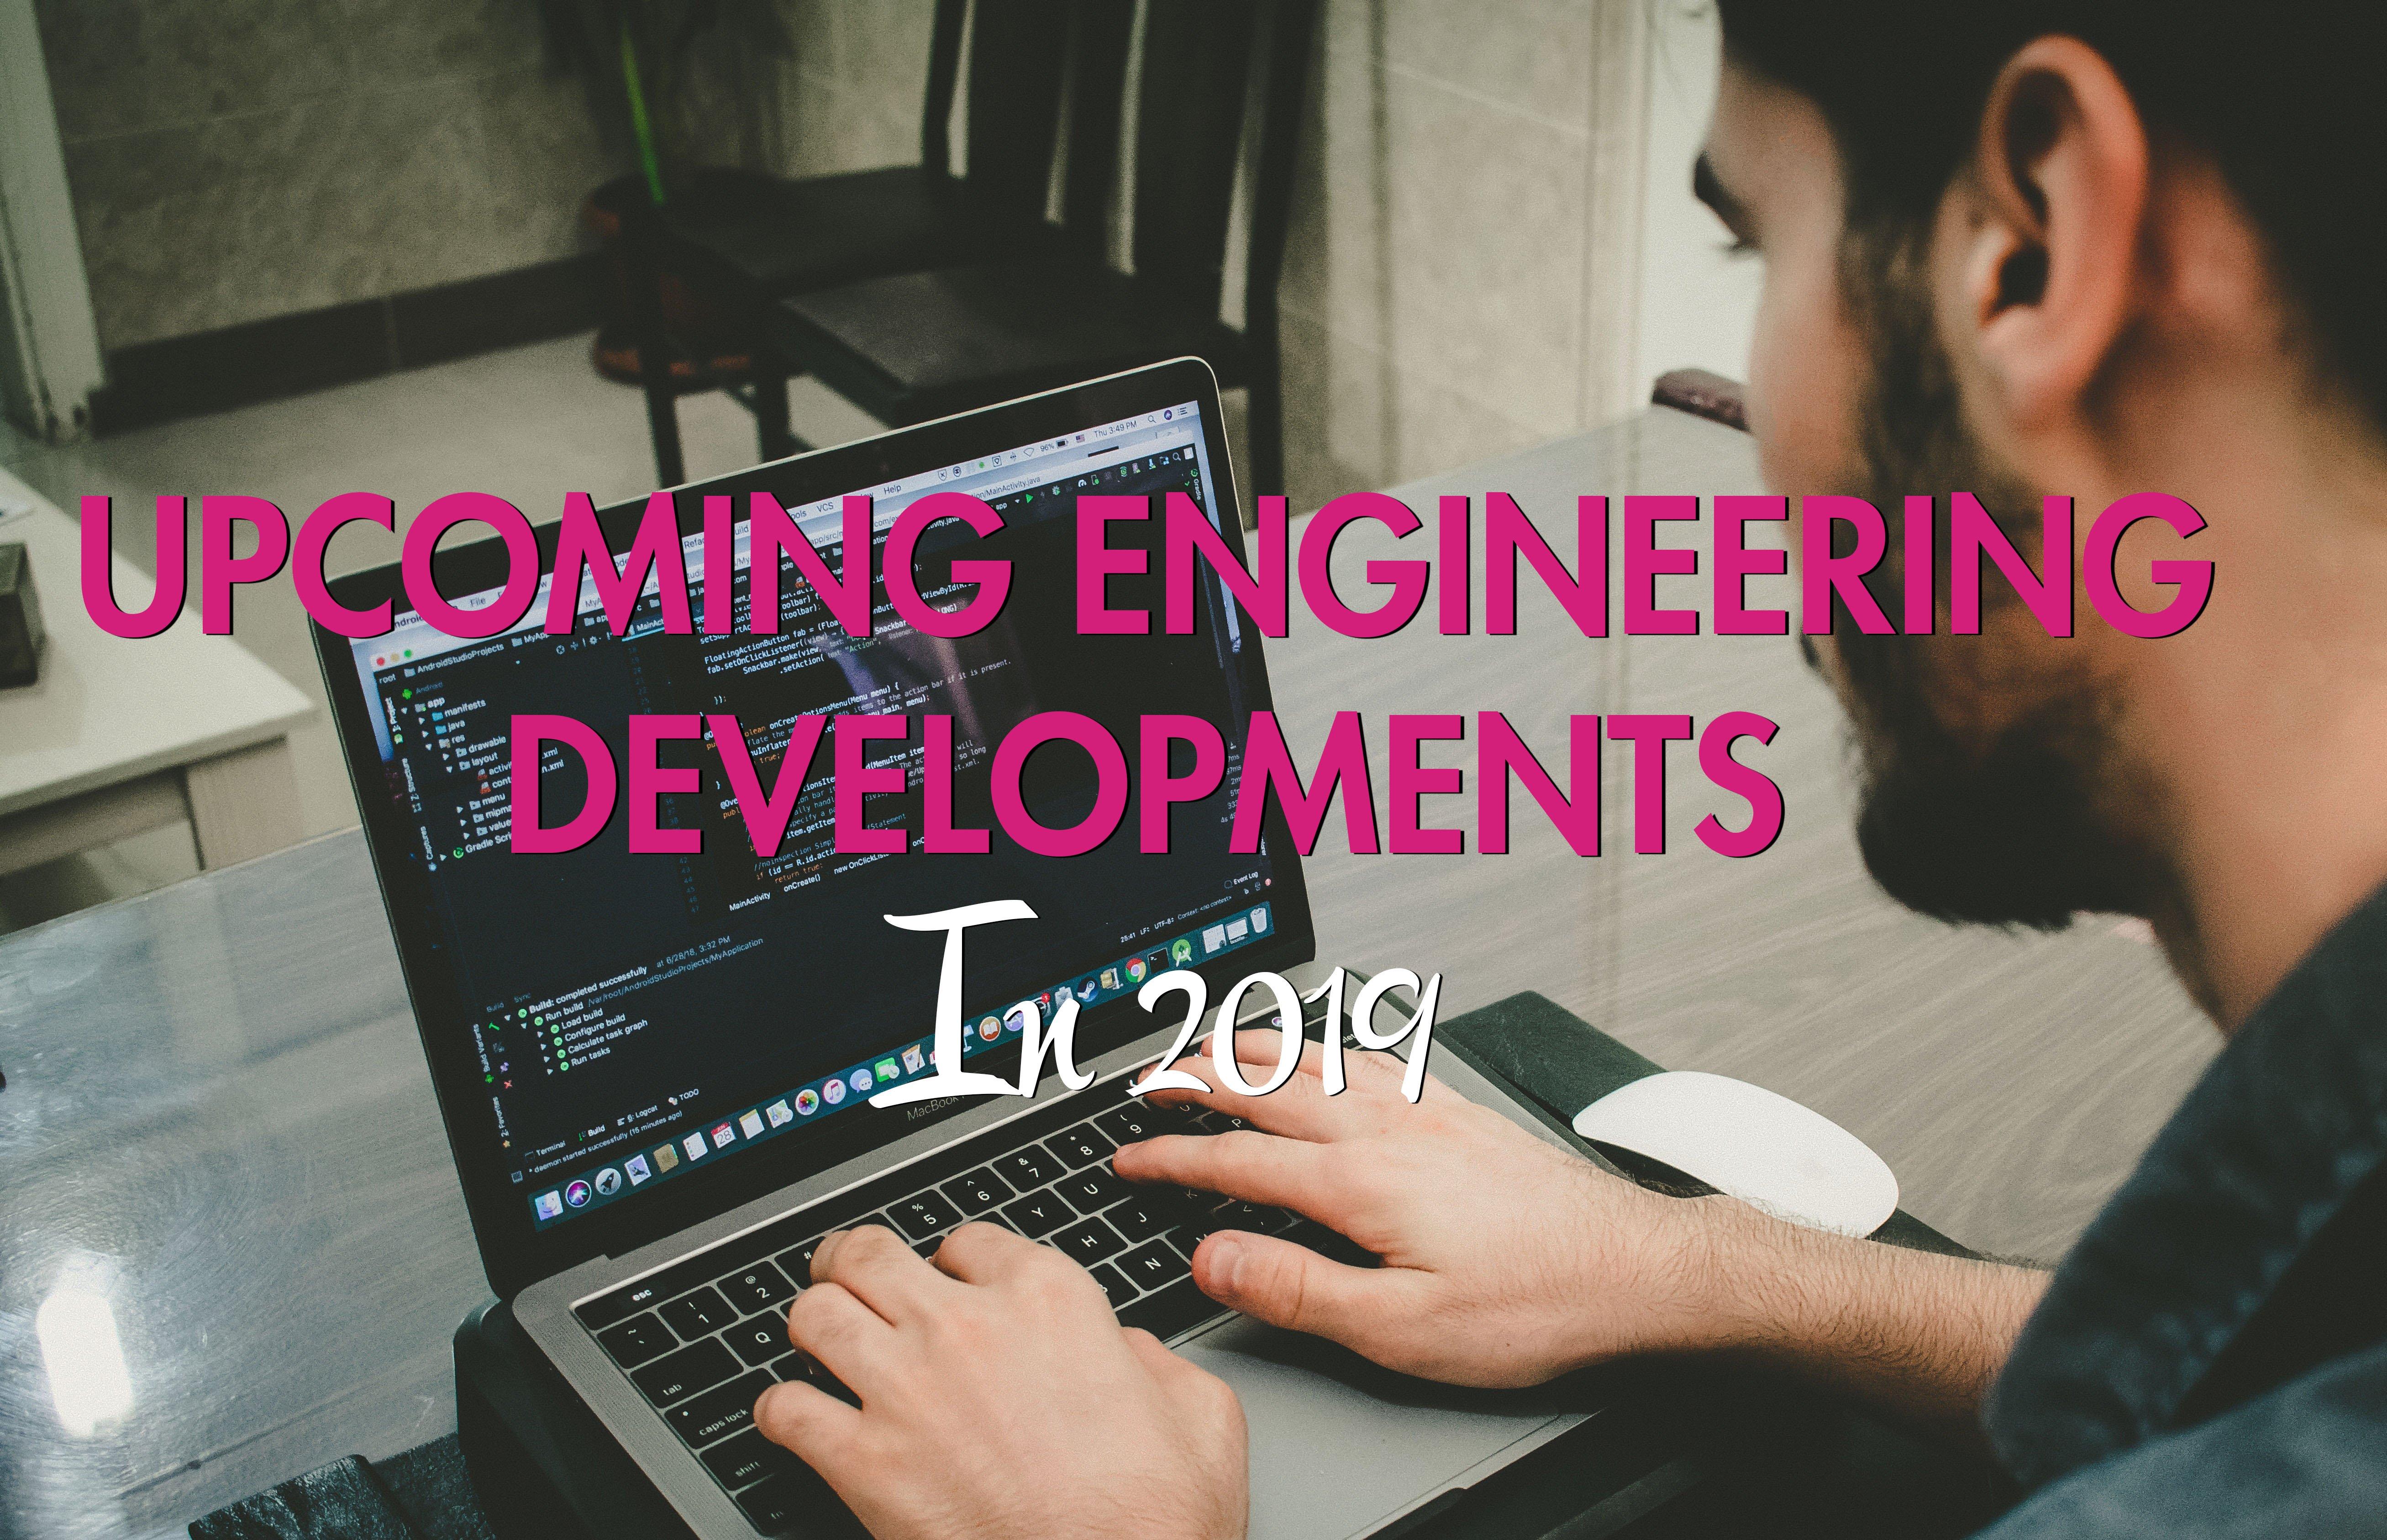 enginering developments 2019